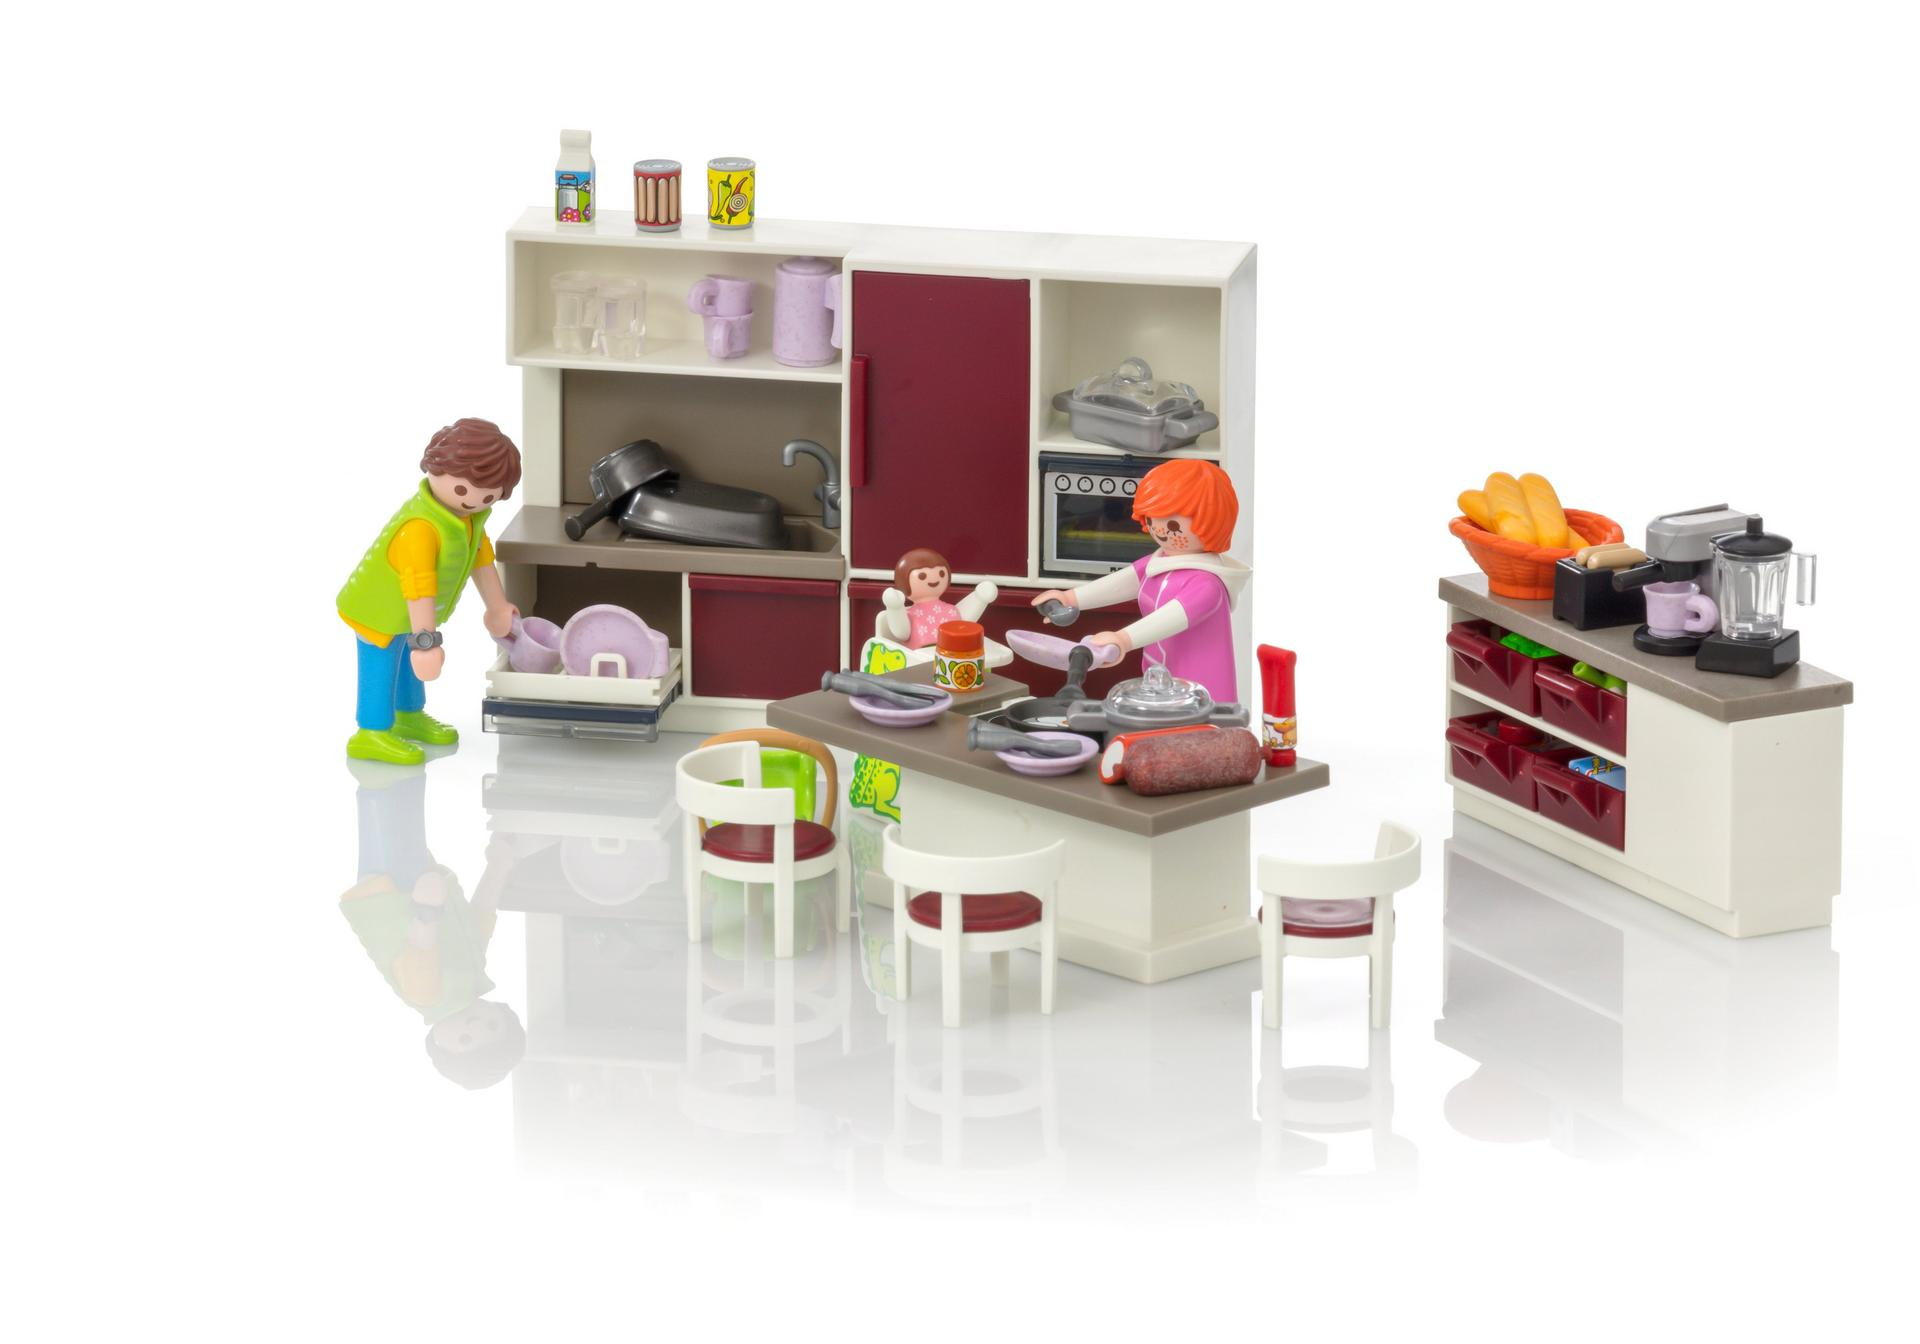 Kitchen - 9269 - PLAYMOBIL® USA